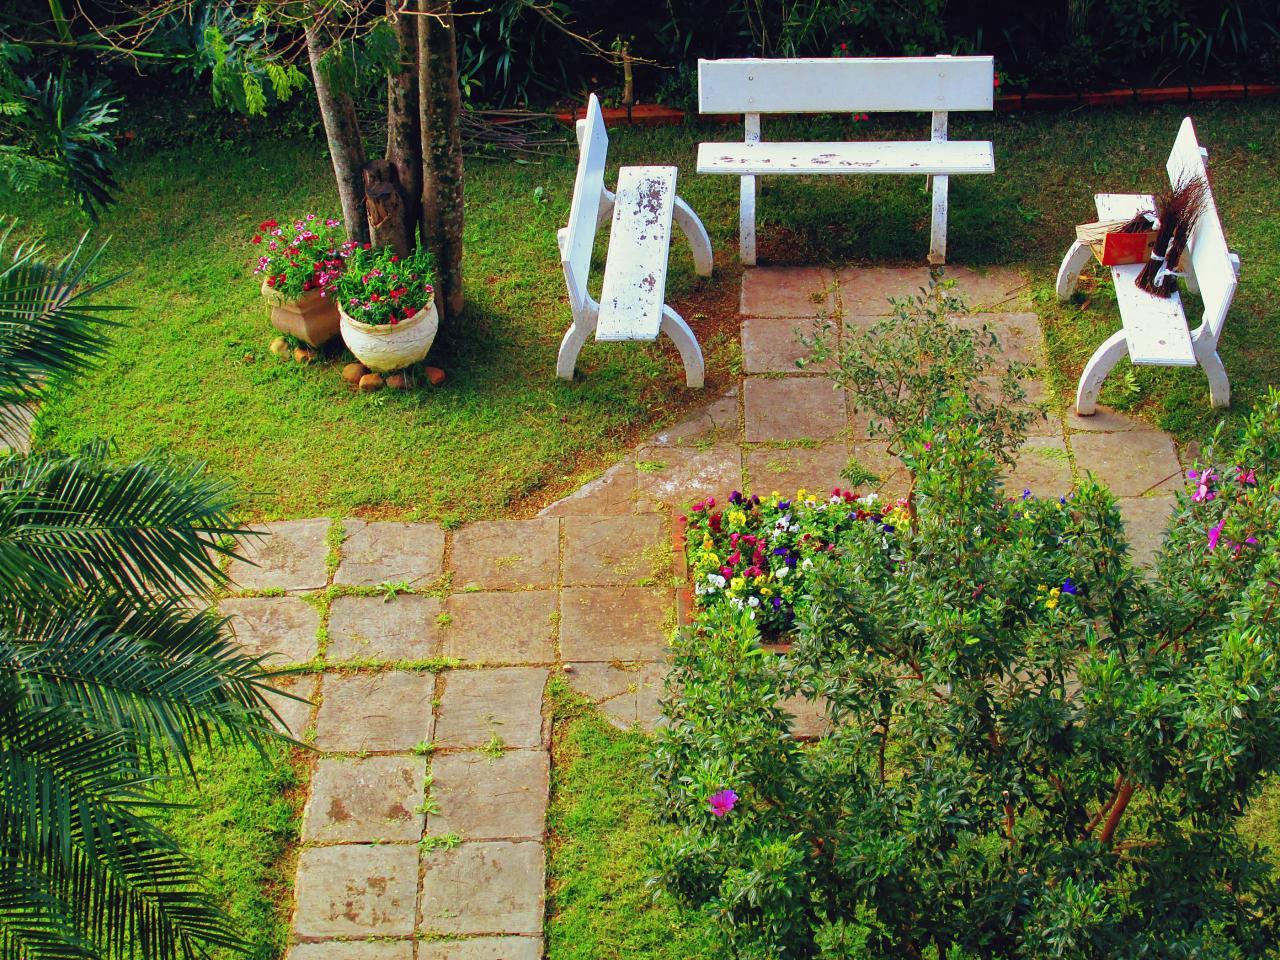 dise os atractivos para jardines peque os lifestyle de